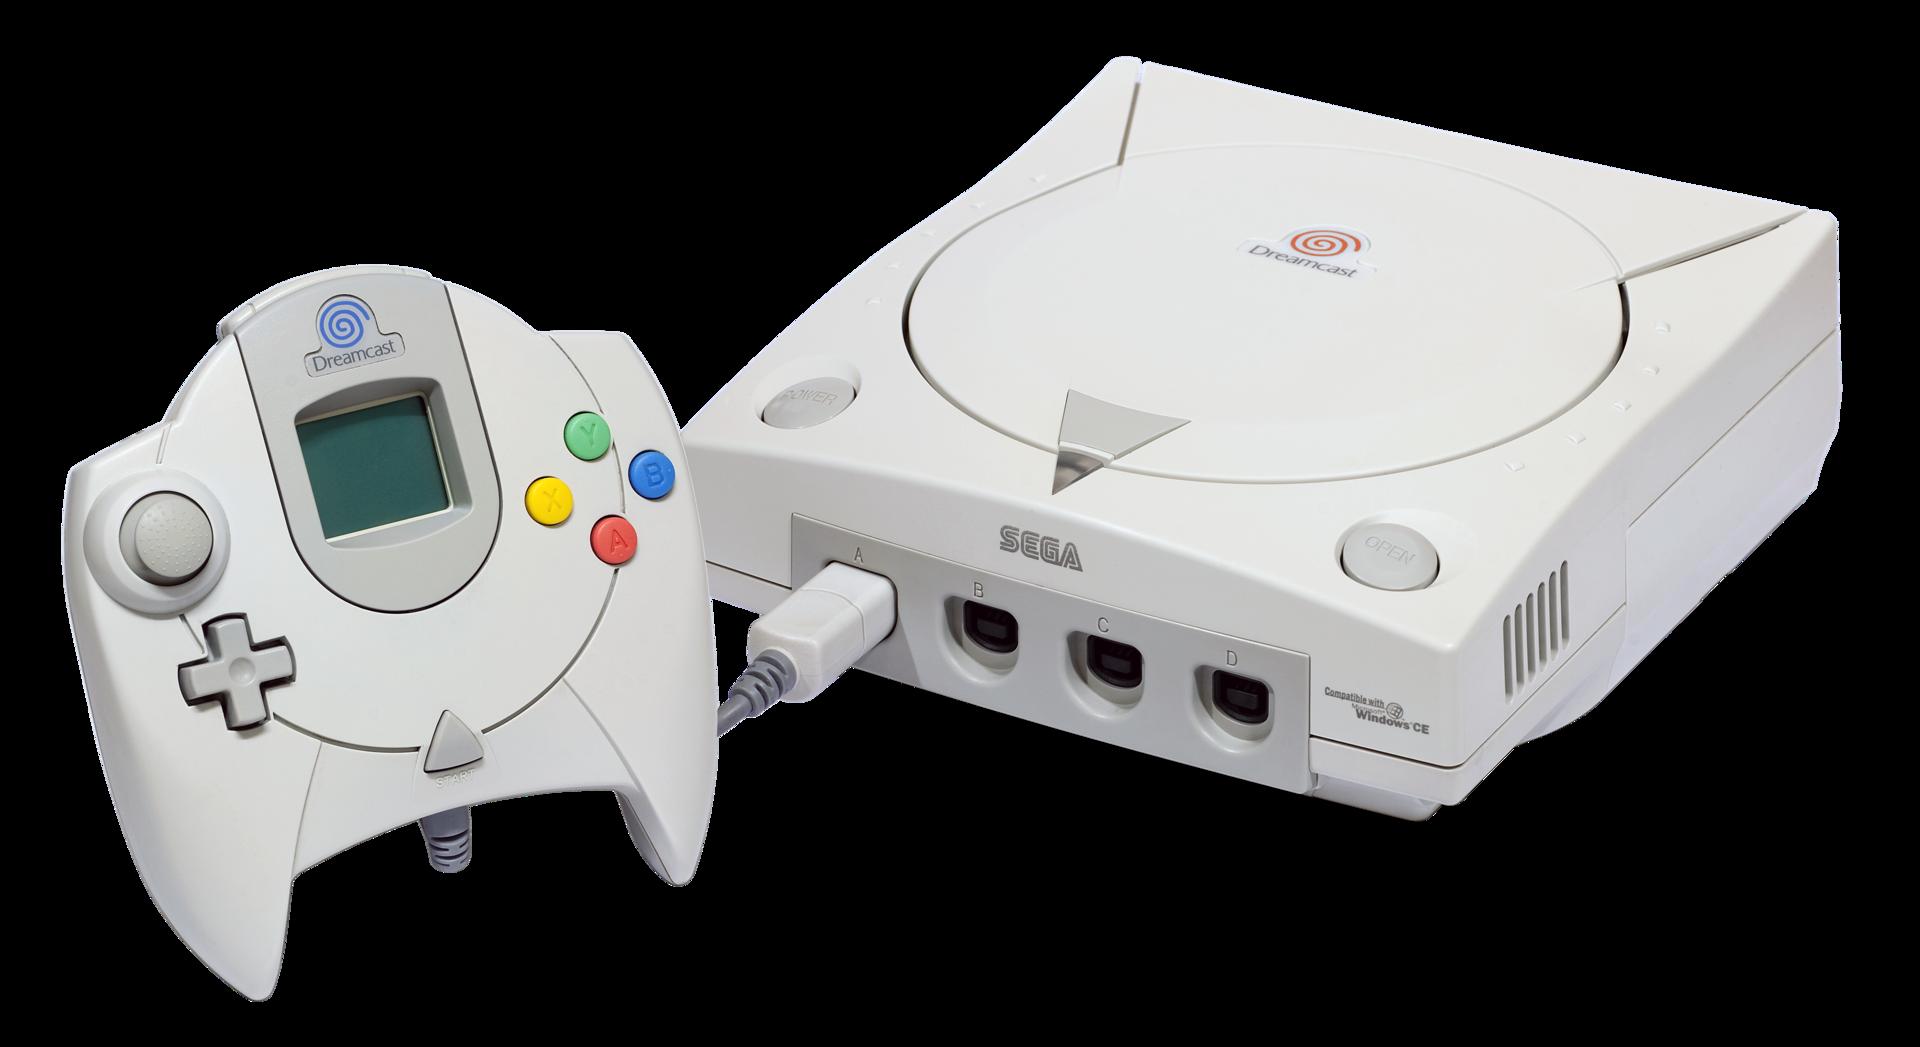 [HILO OFICIAL]Sega Dreamcast 1920px-Sega-dreamcast-set